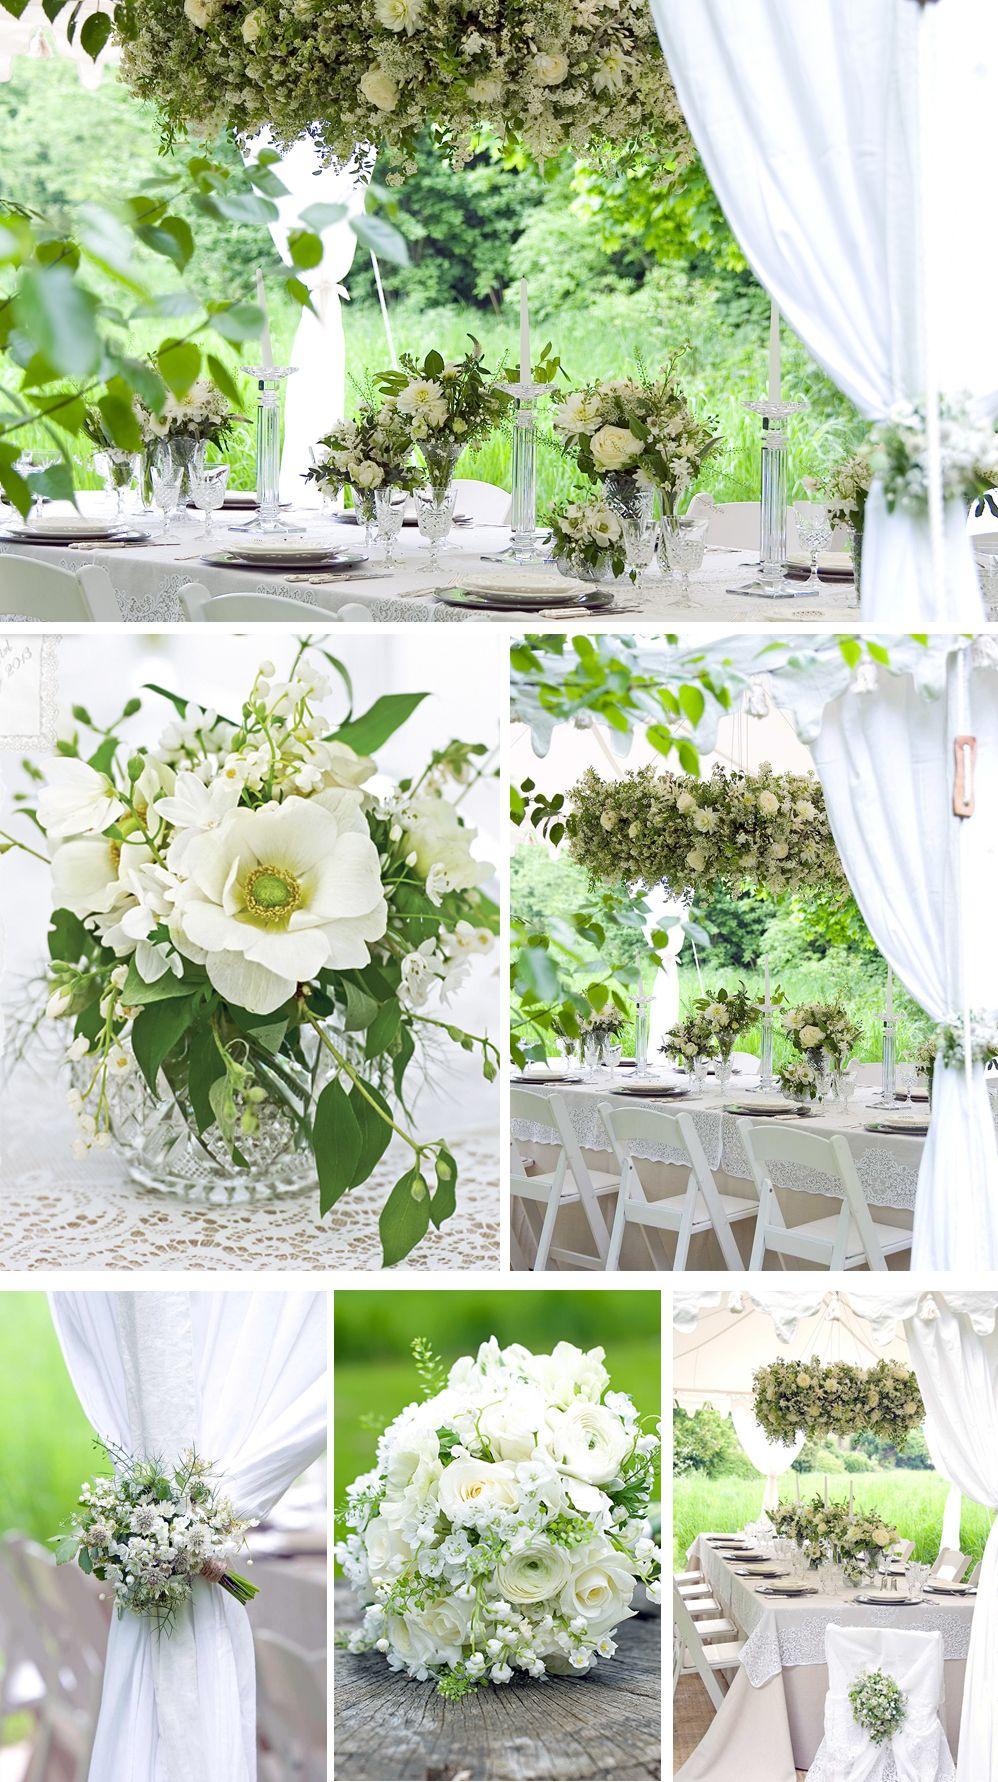 Luxury wedding flowers by Philippa Craddock, acclaimed wedding ...